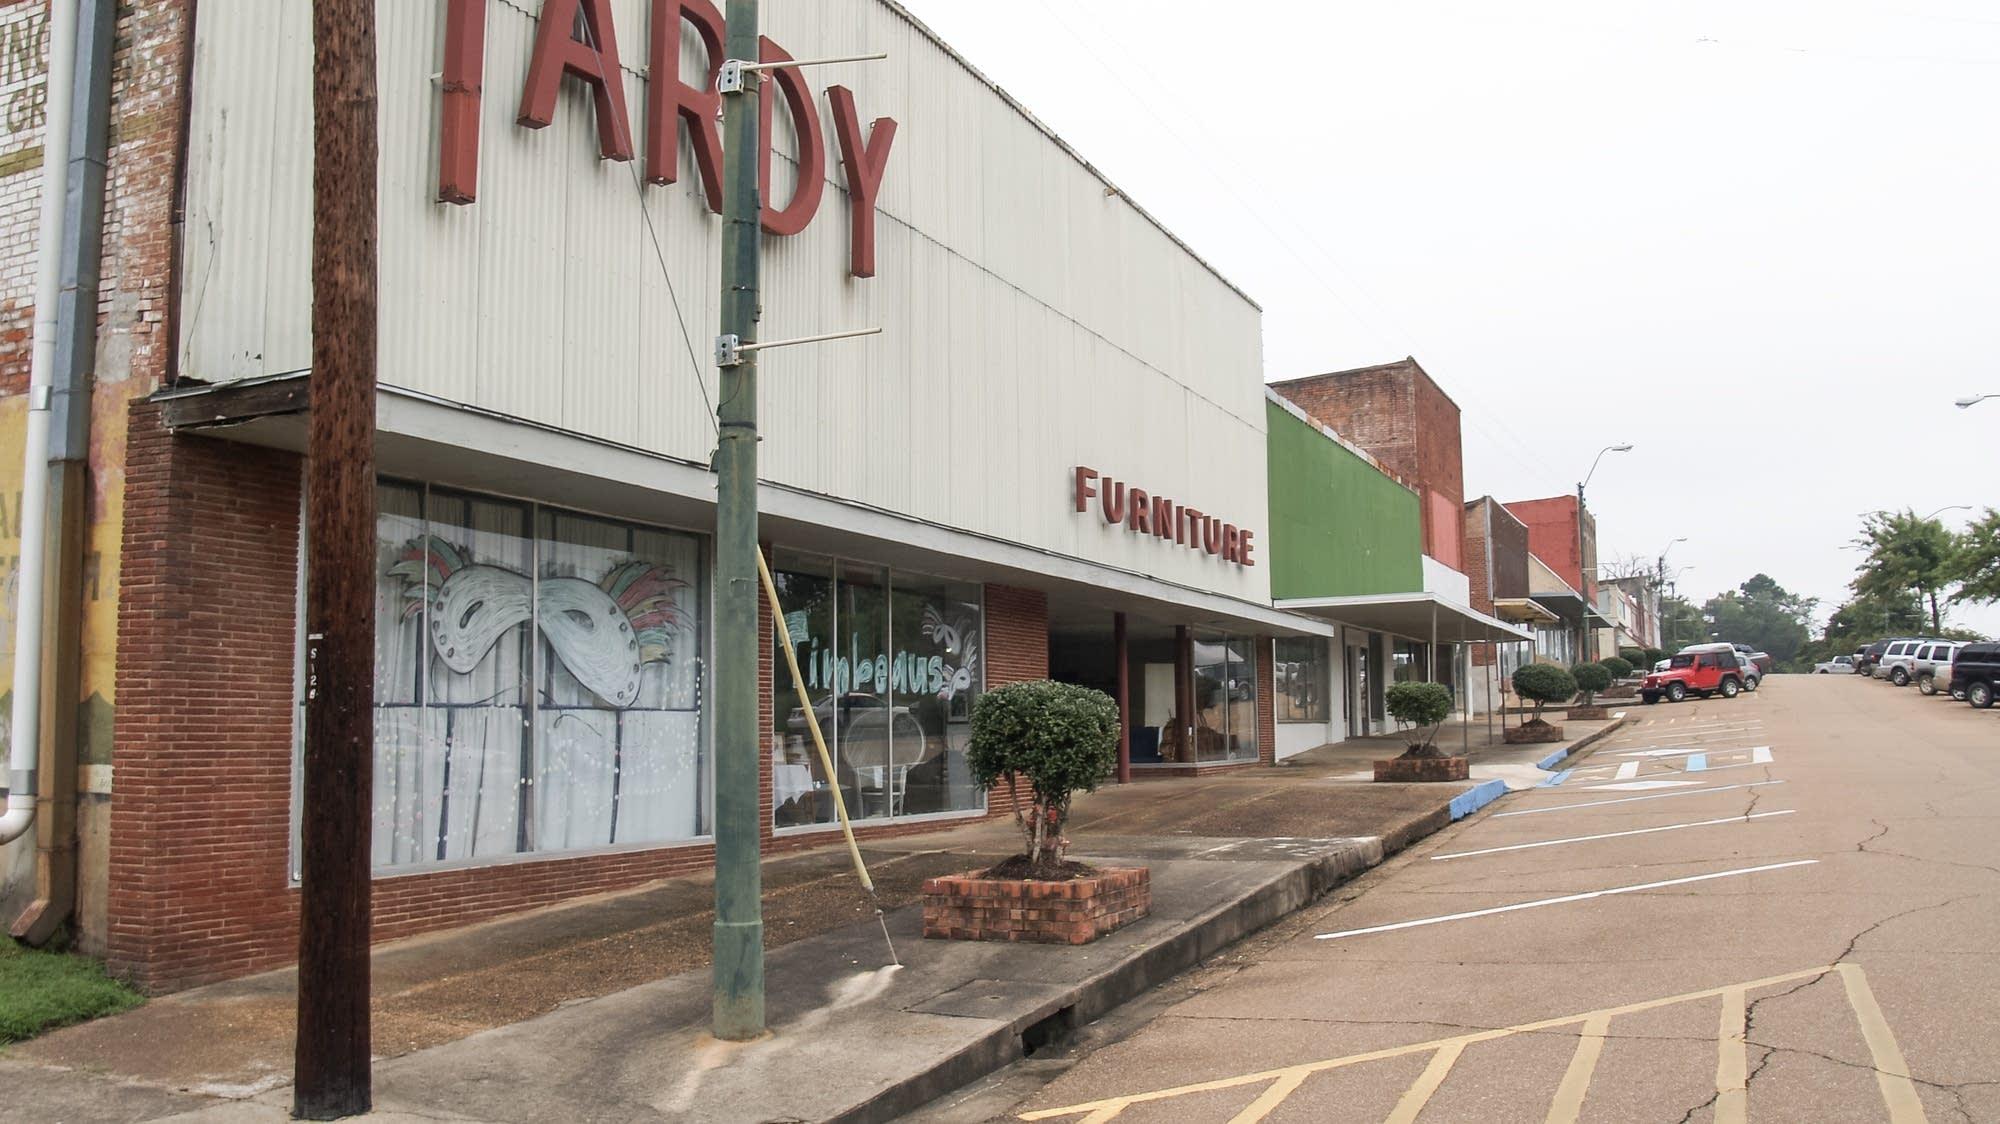 Tardy Furniture Store